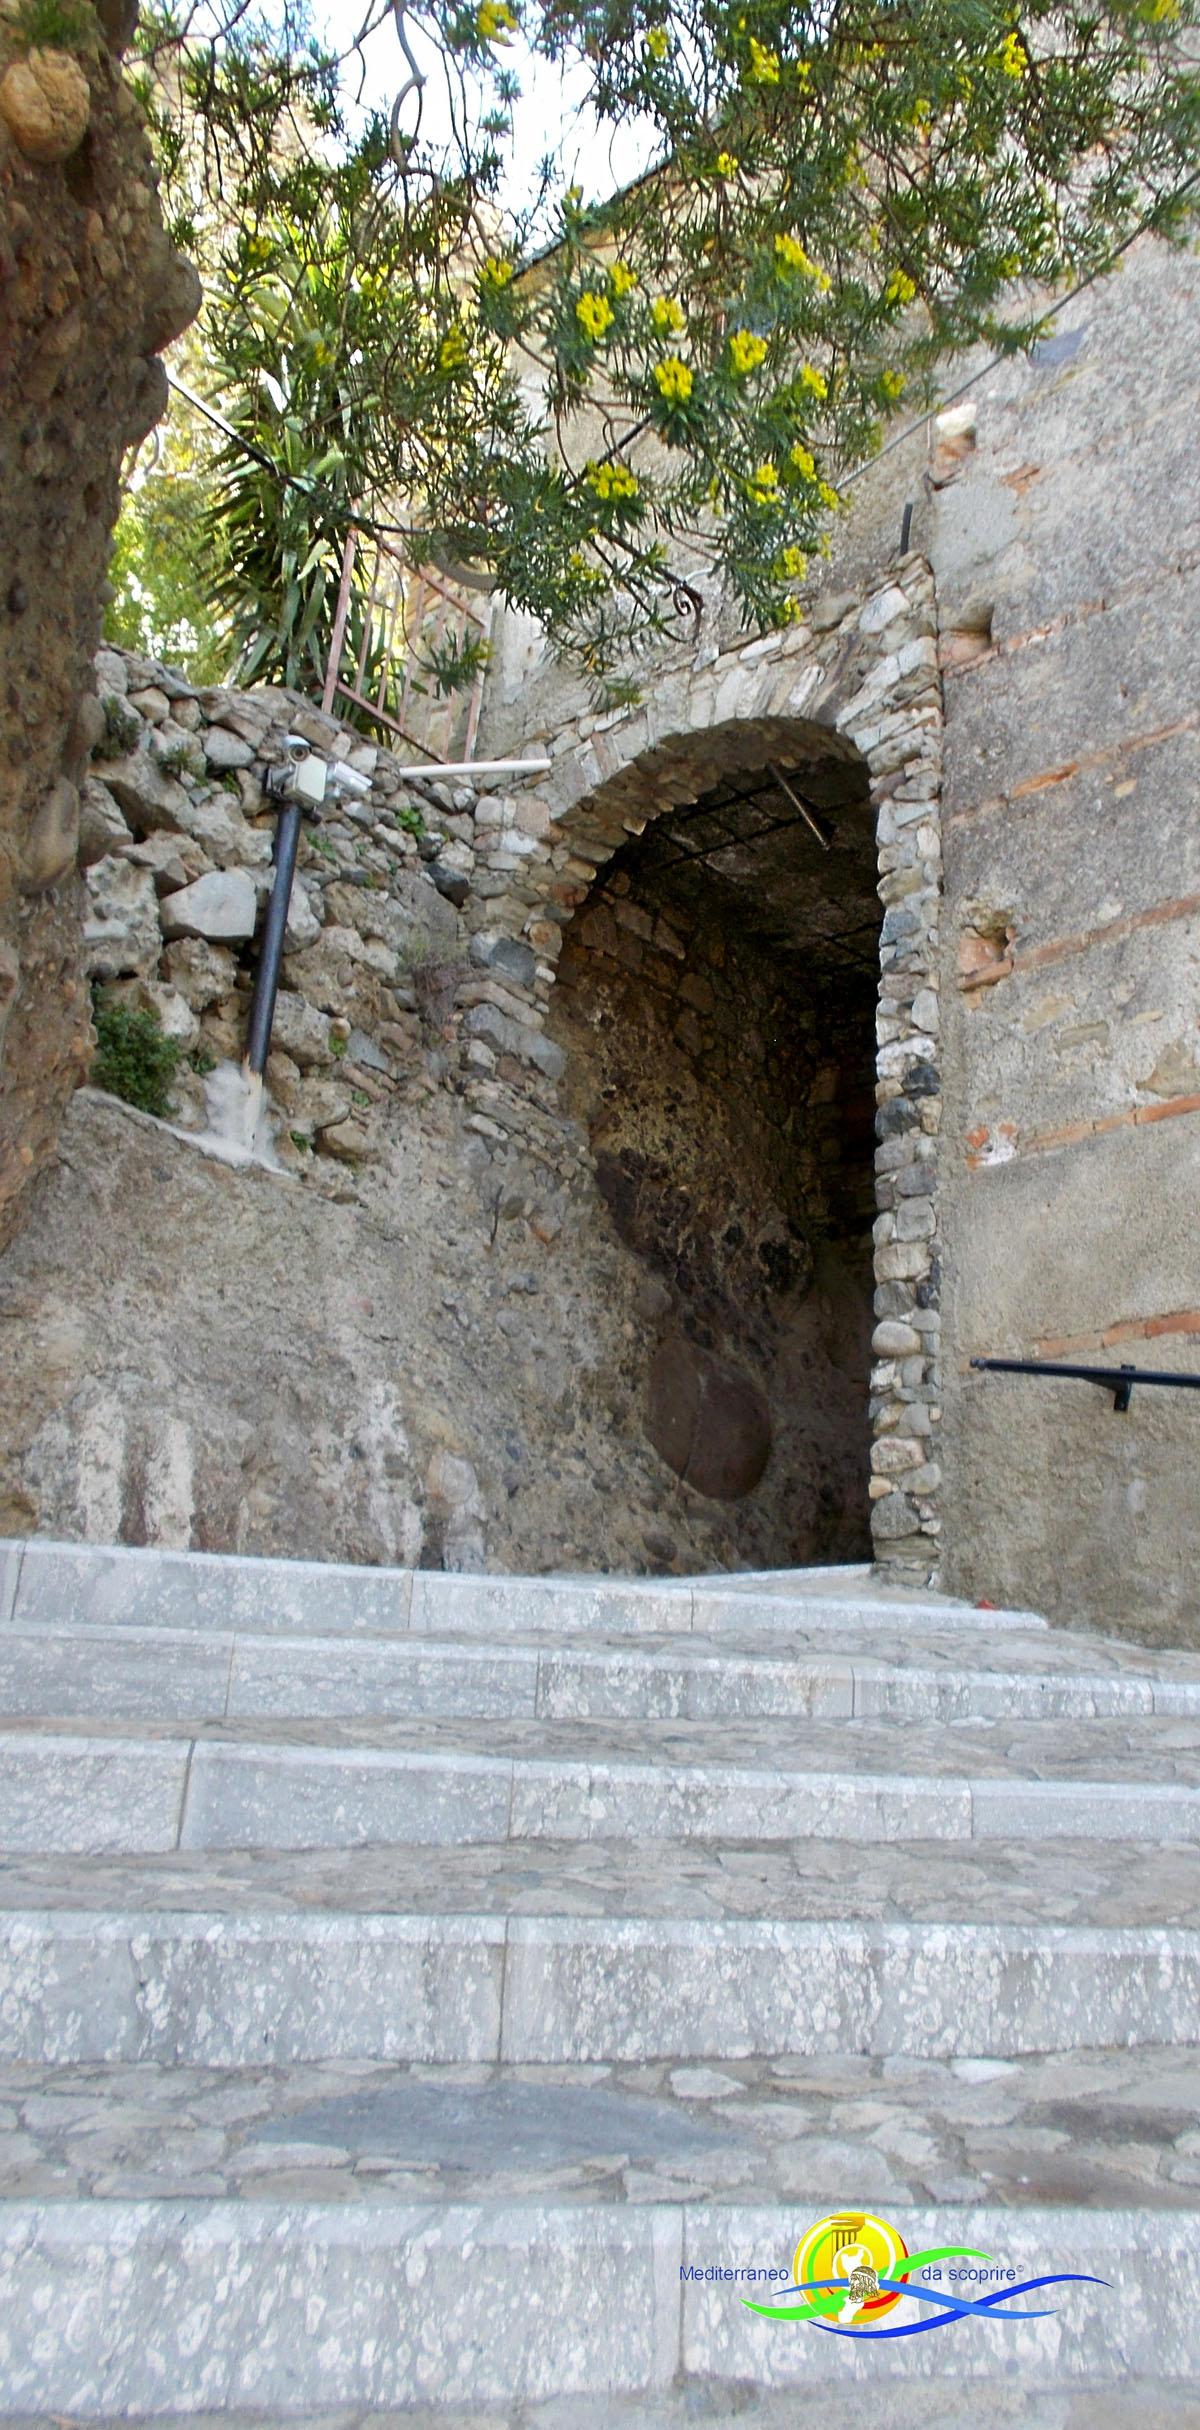 Mediterraneo da scoprire-Pentedattilo